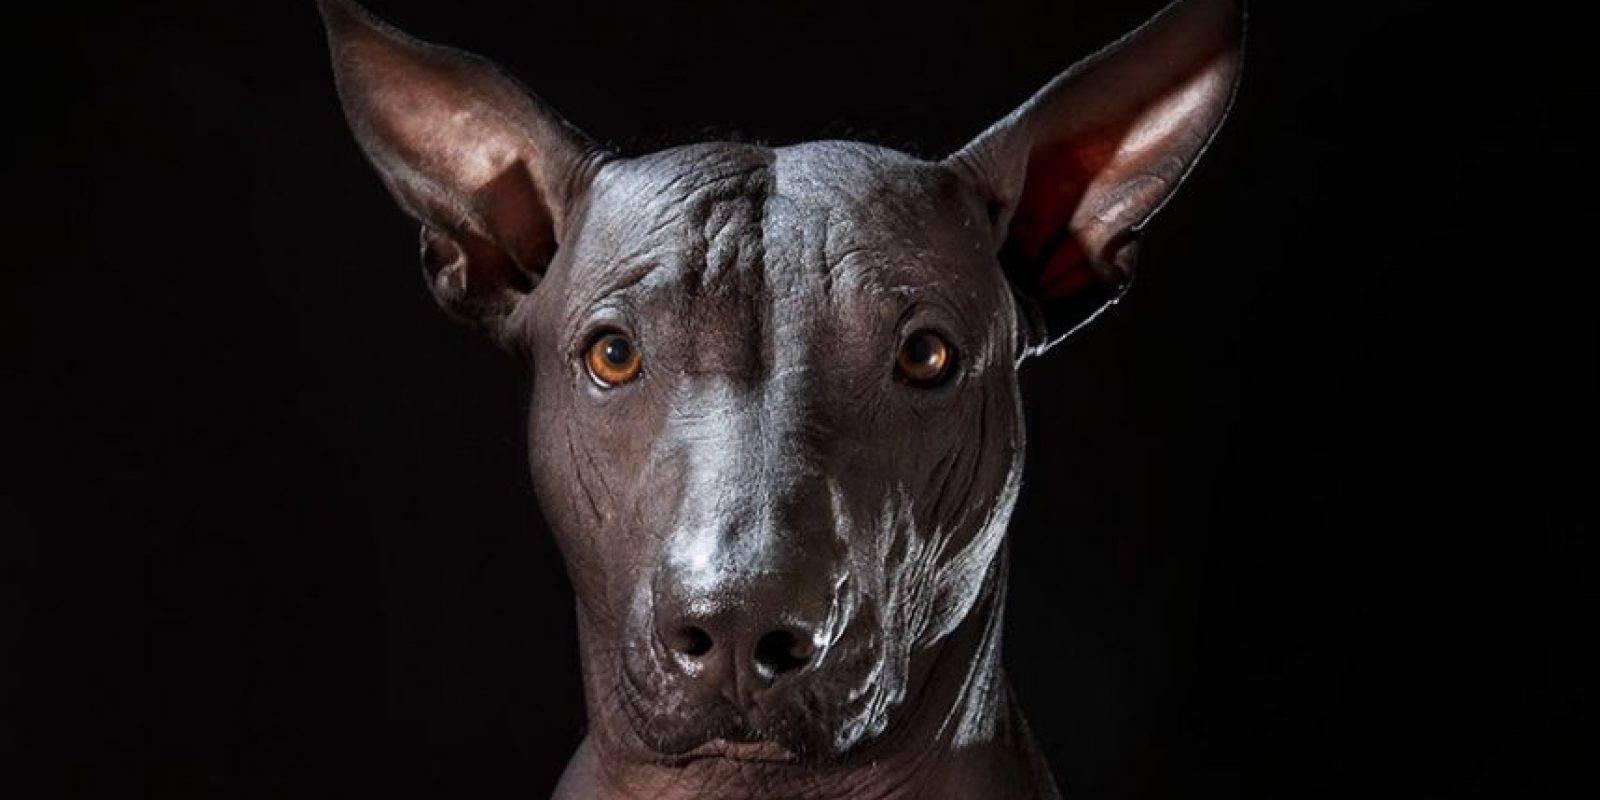 Ксолоитцкуинтли - характер, дрессировка и необходимый уход для собаки (120 фото)